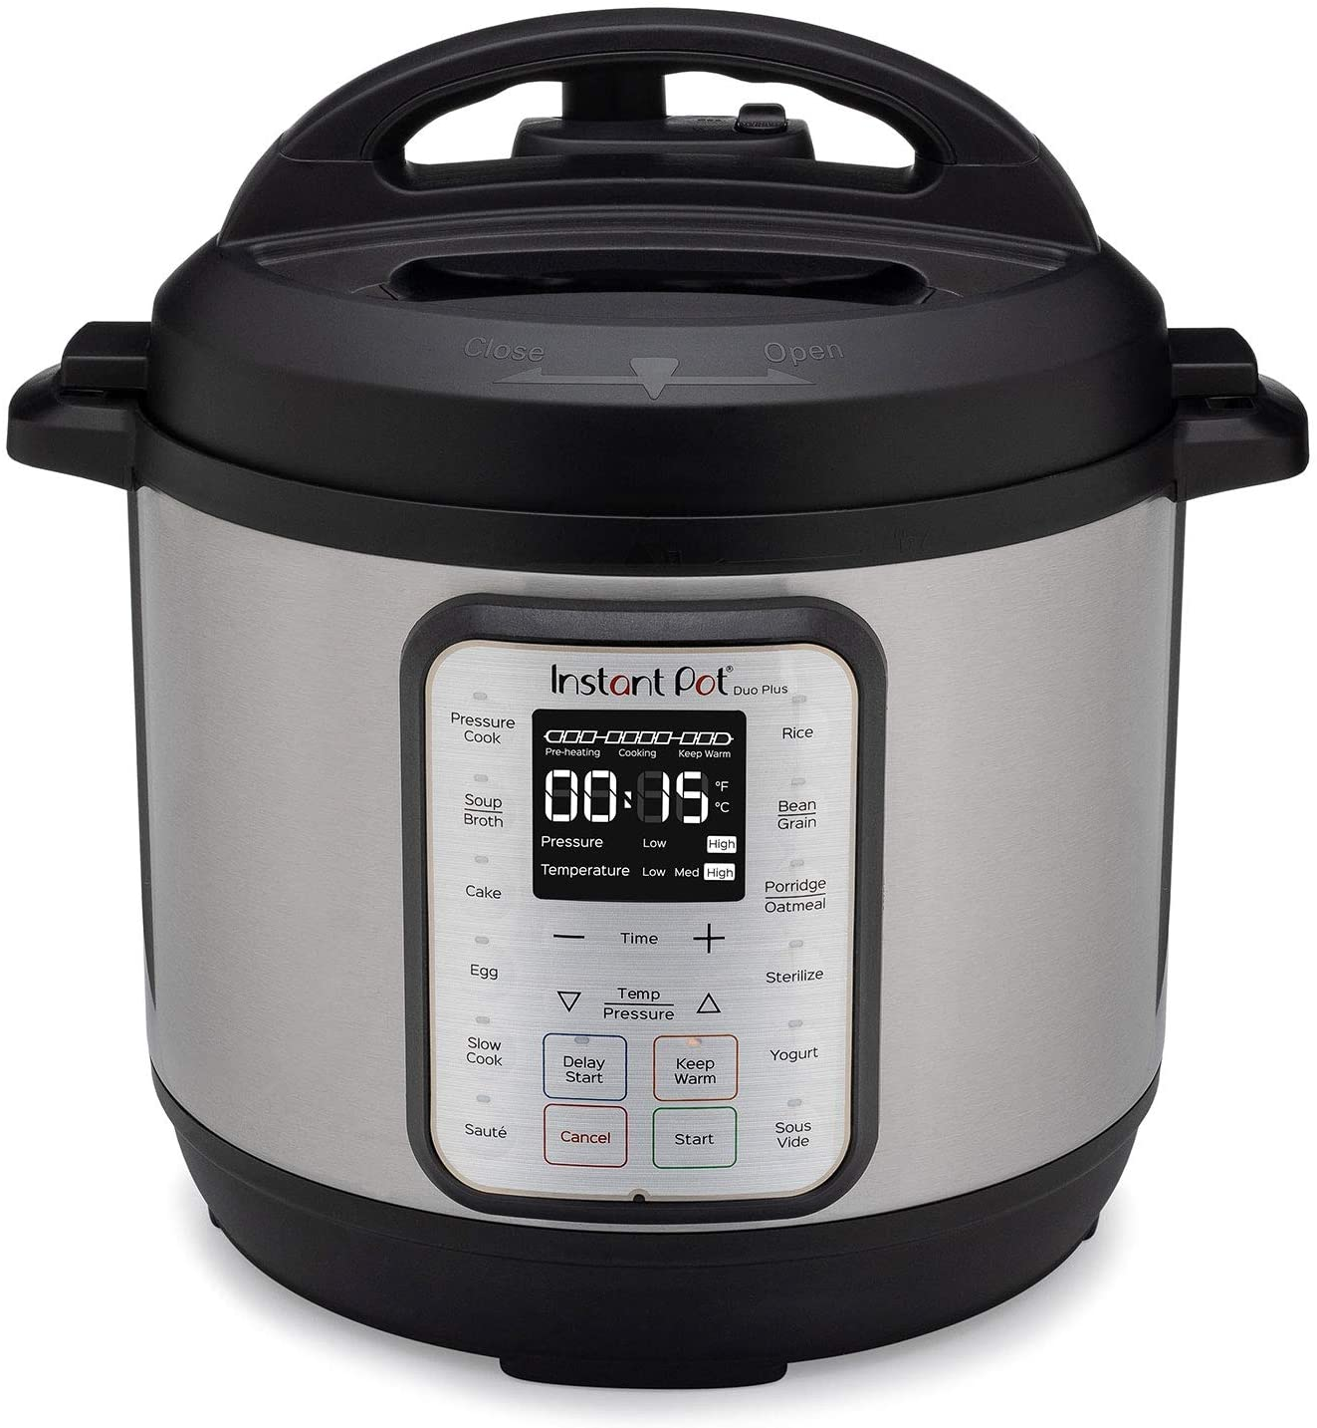 Instant Pot Duo Plus 6 Quart 9-in-1 Electric Pressure Cooker, Slow Cooker, Rice Cooker, Steamer, Sauté, Yogurt Maker, Warmer & Sterilizer, 15 One-Touch Programs